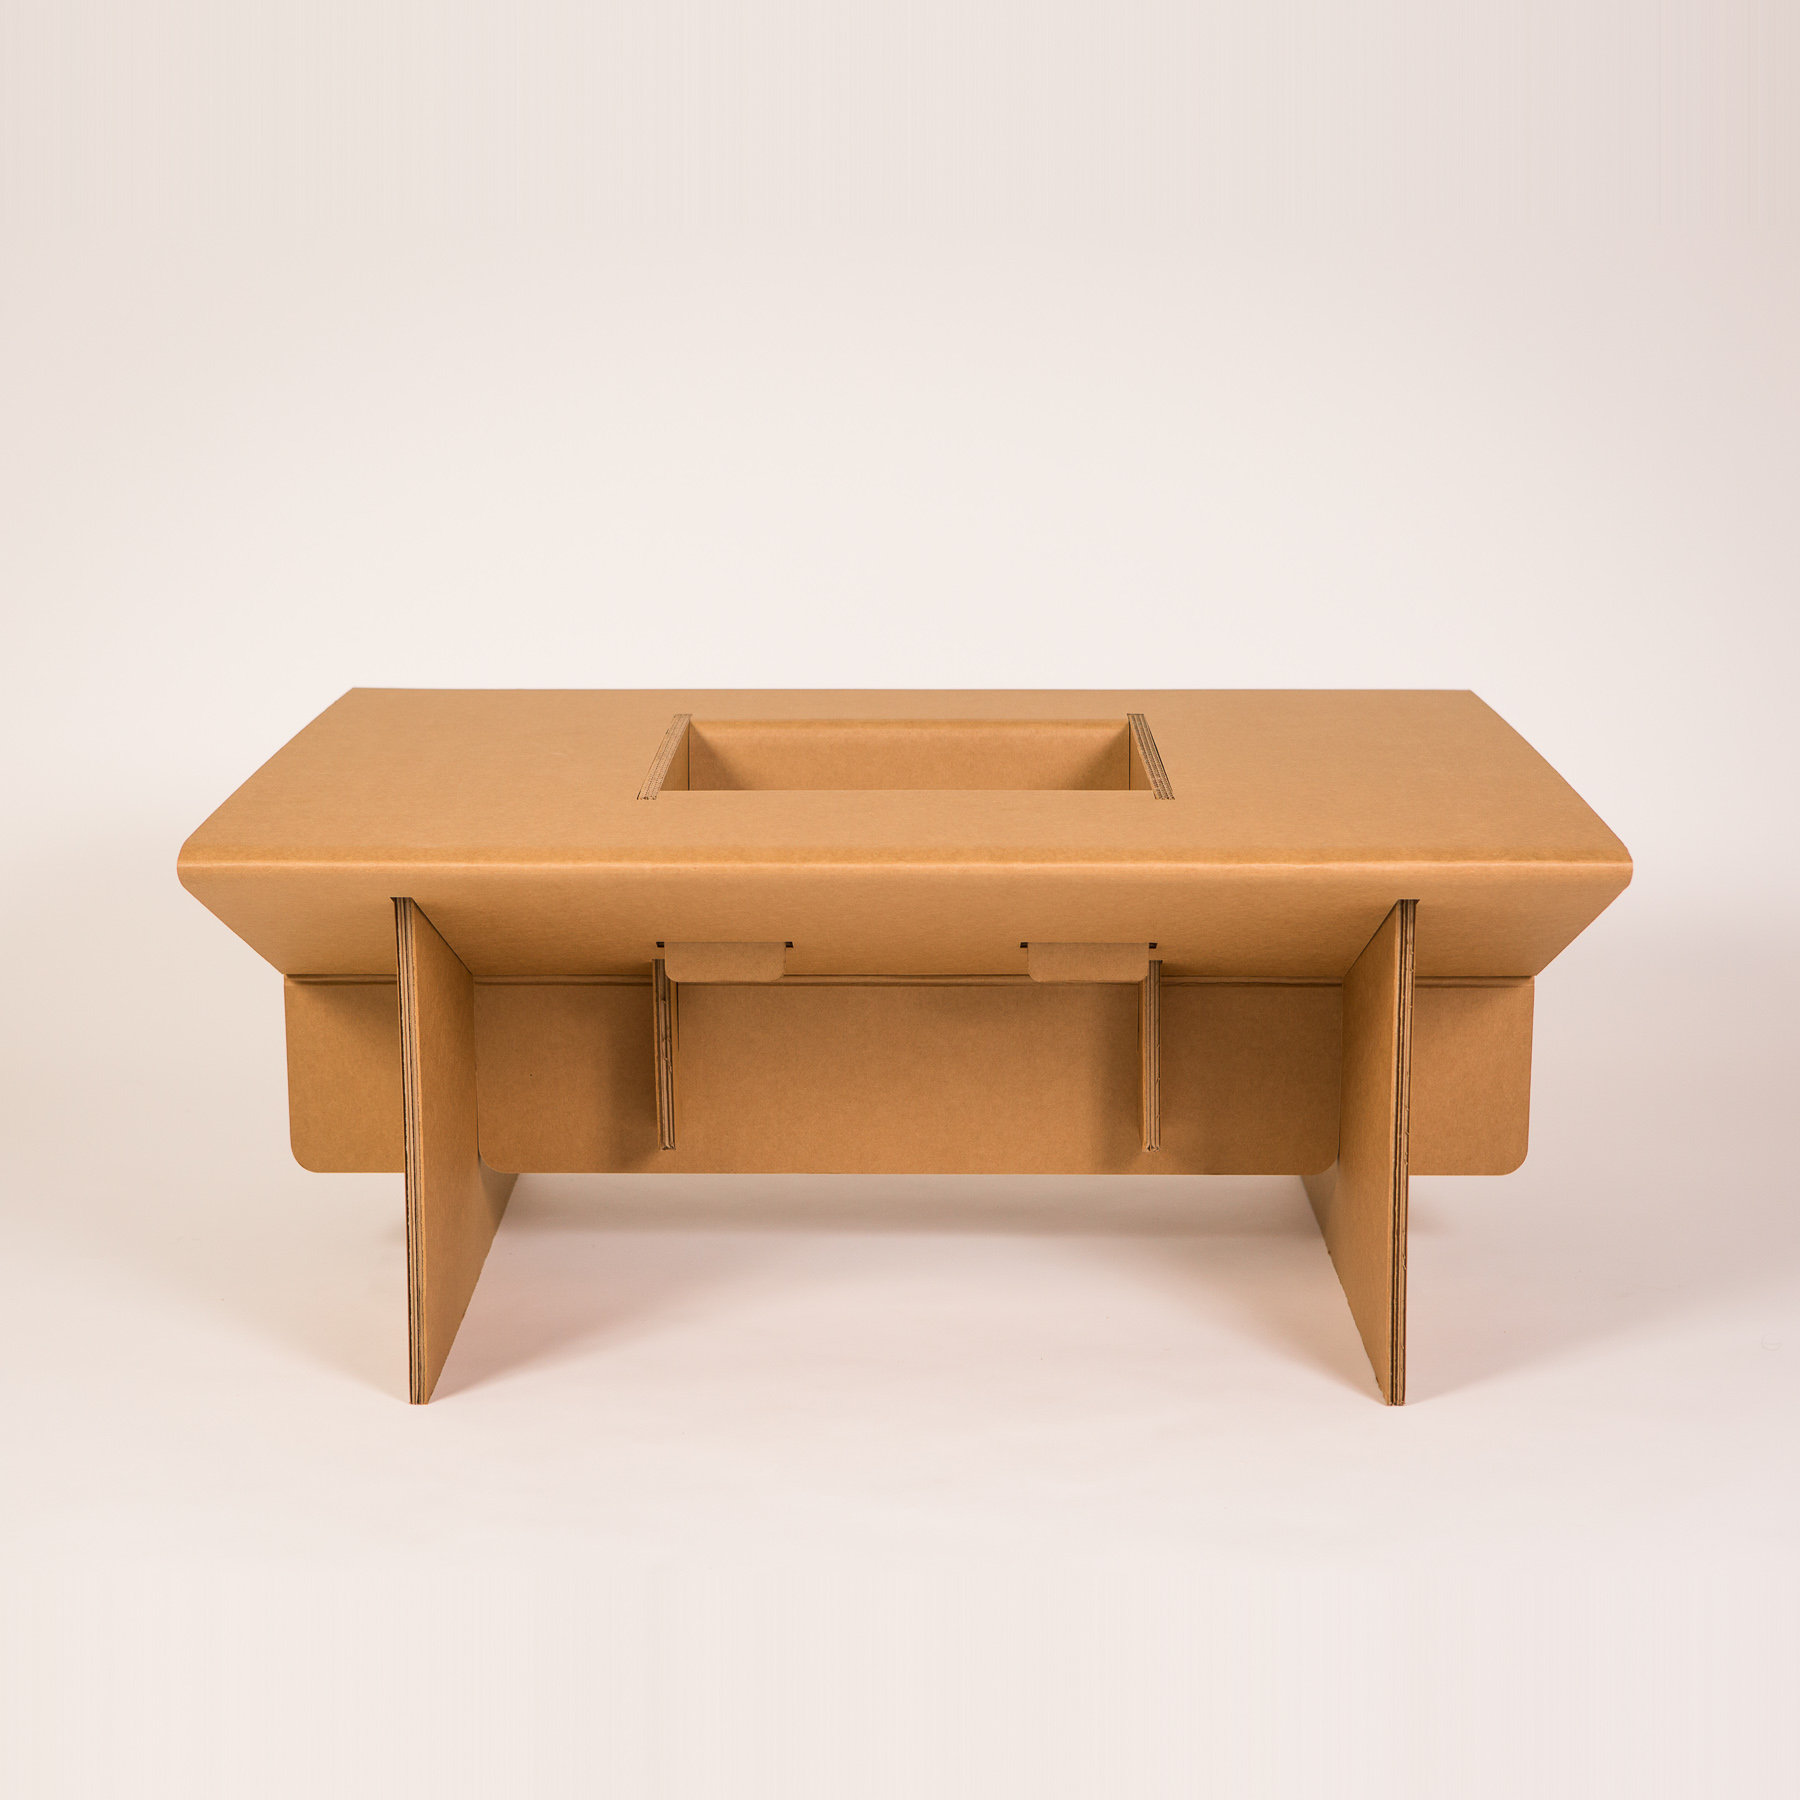 Cardboard Play Table Chairigami